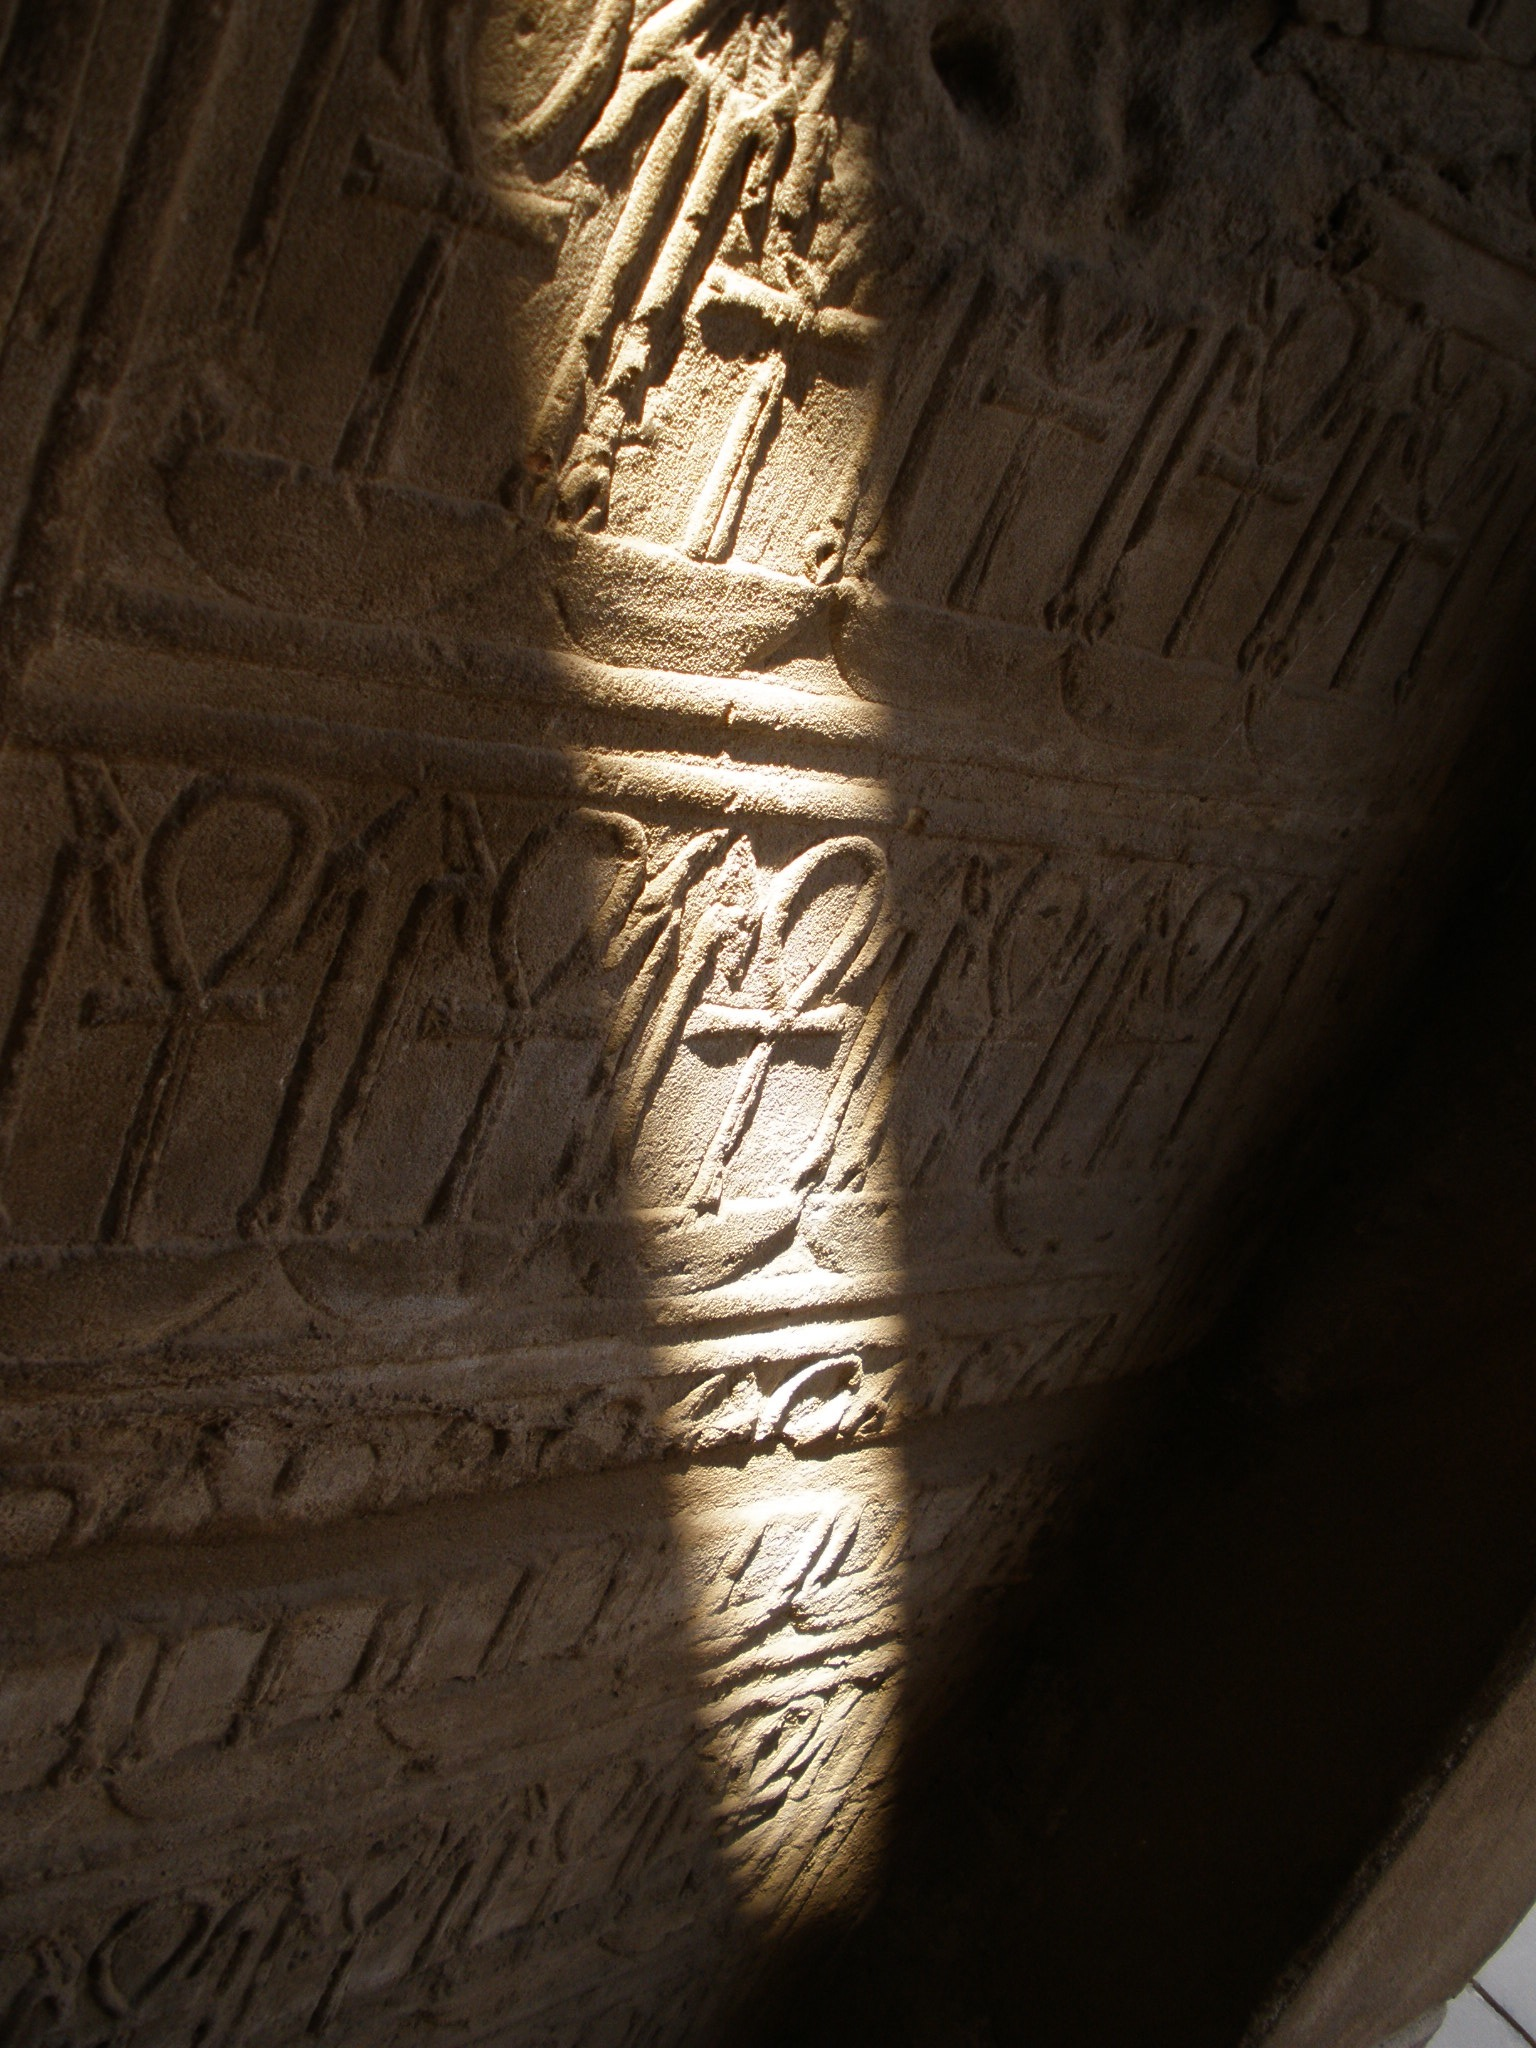 Detalle en el Templo de Karnak